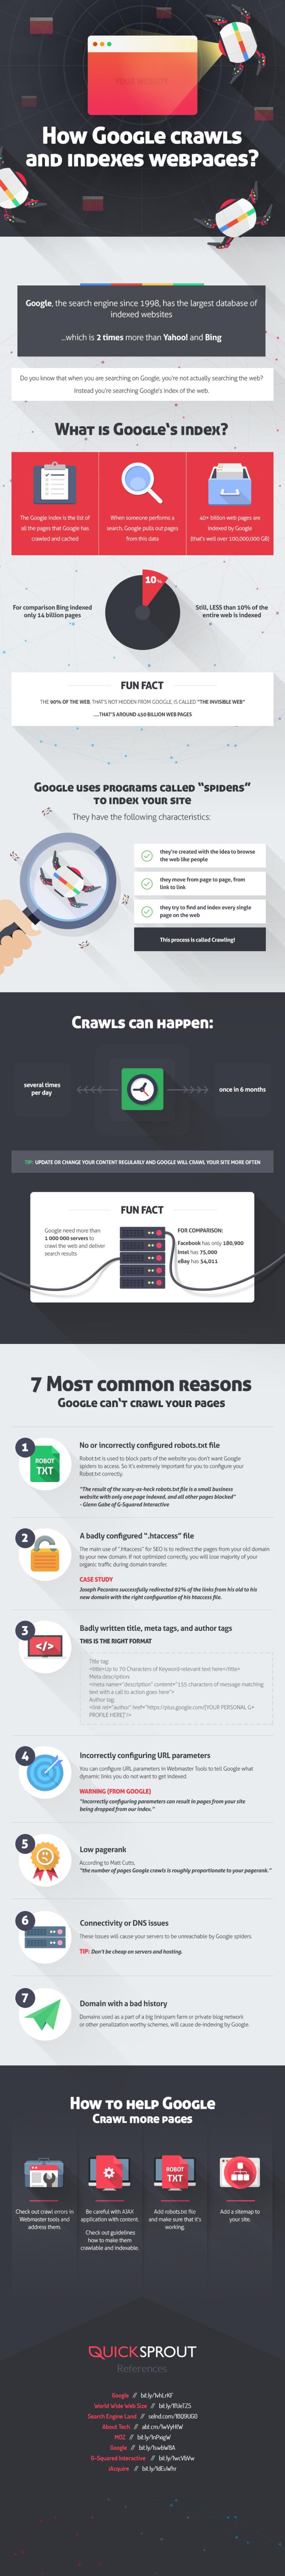 Como-rastrea-e-indexa-Google-las-paginas-web2